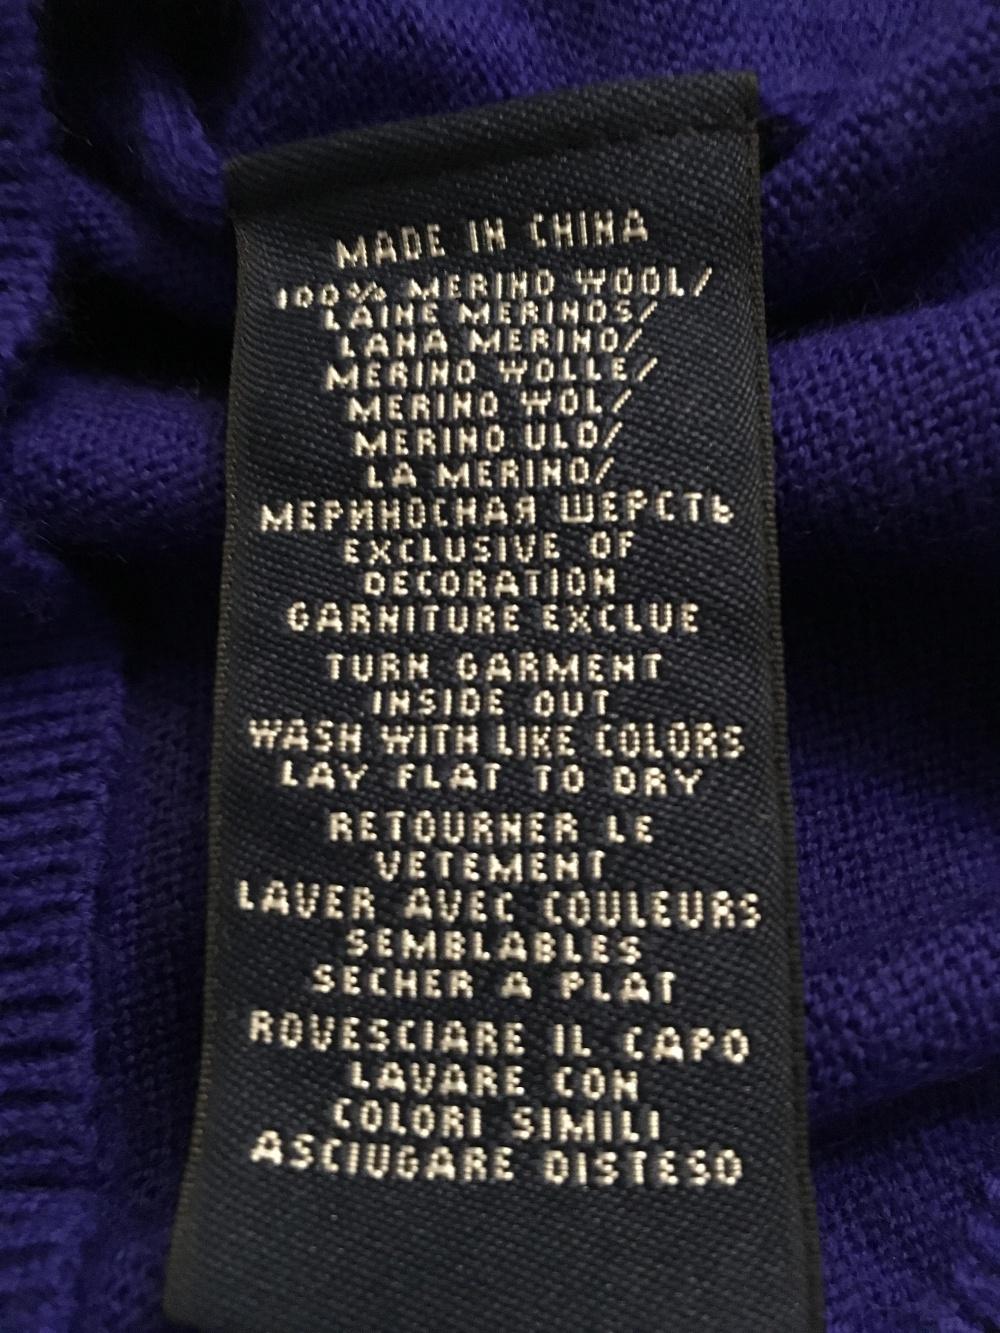 Джемпер Ralph Lauren sport, размер S/M